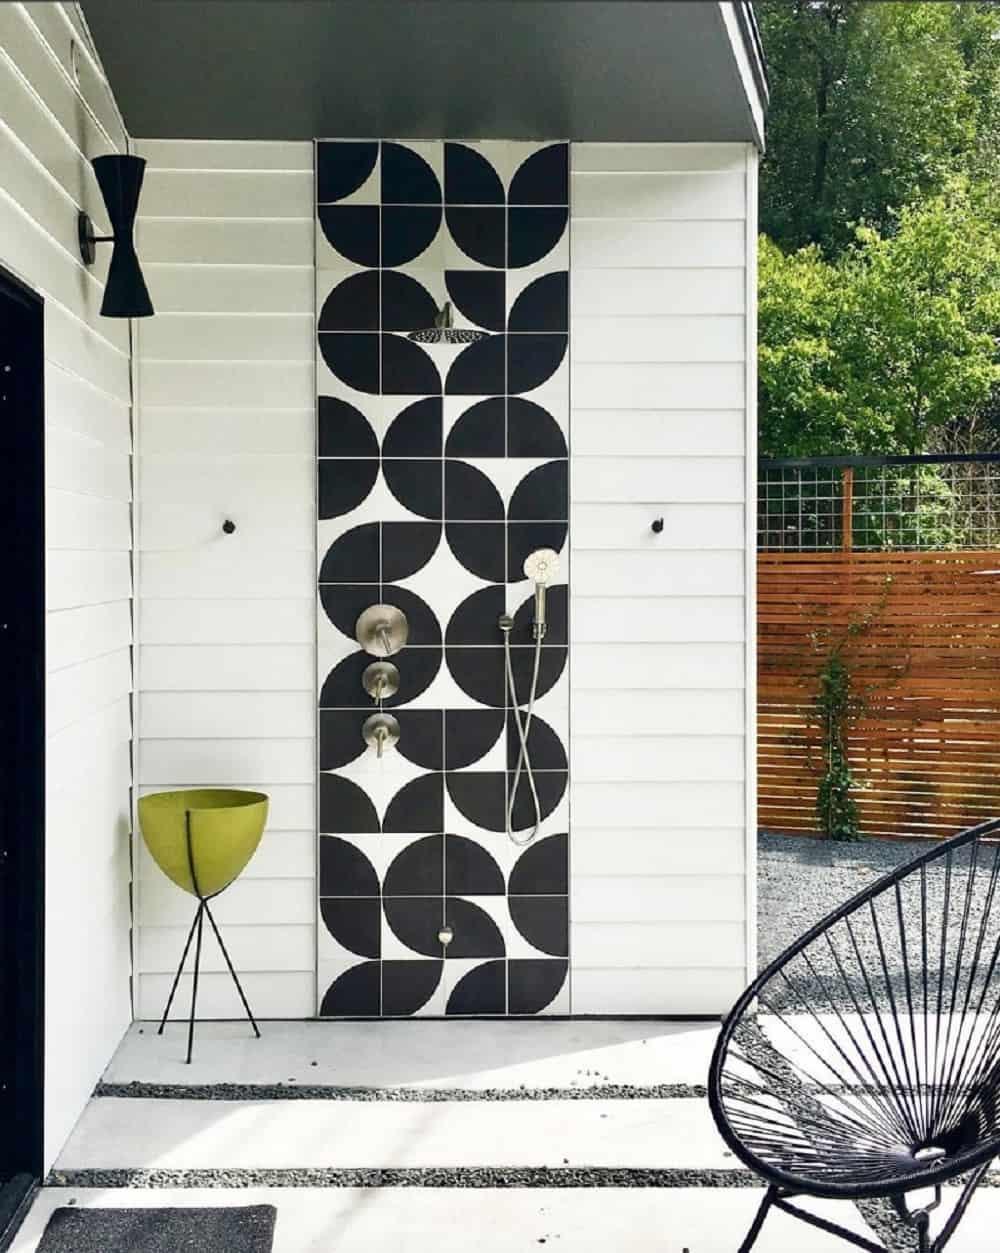 Shower area in the Re-Open House designed by Matt Fajkus Architecture.